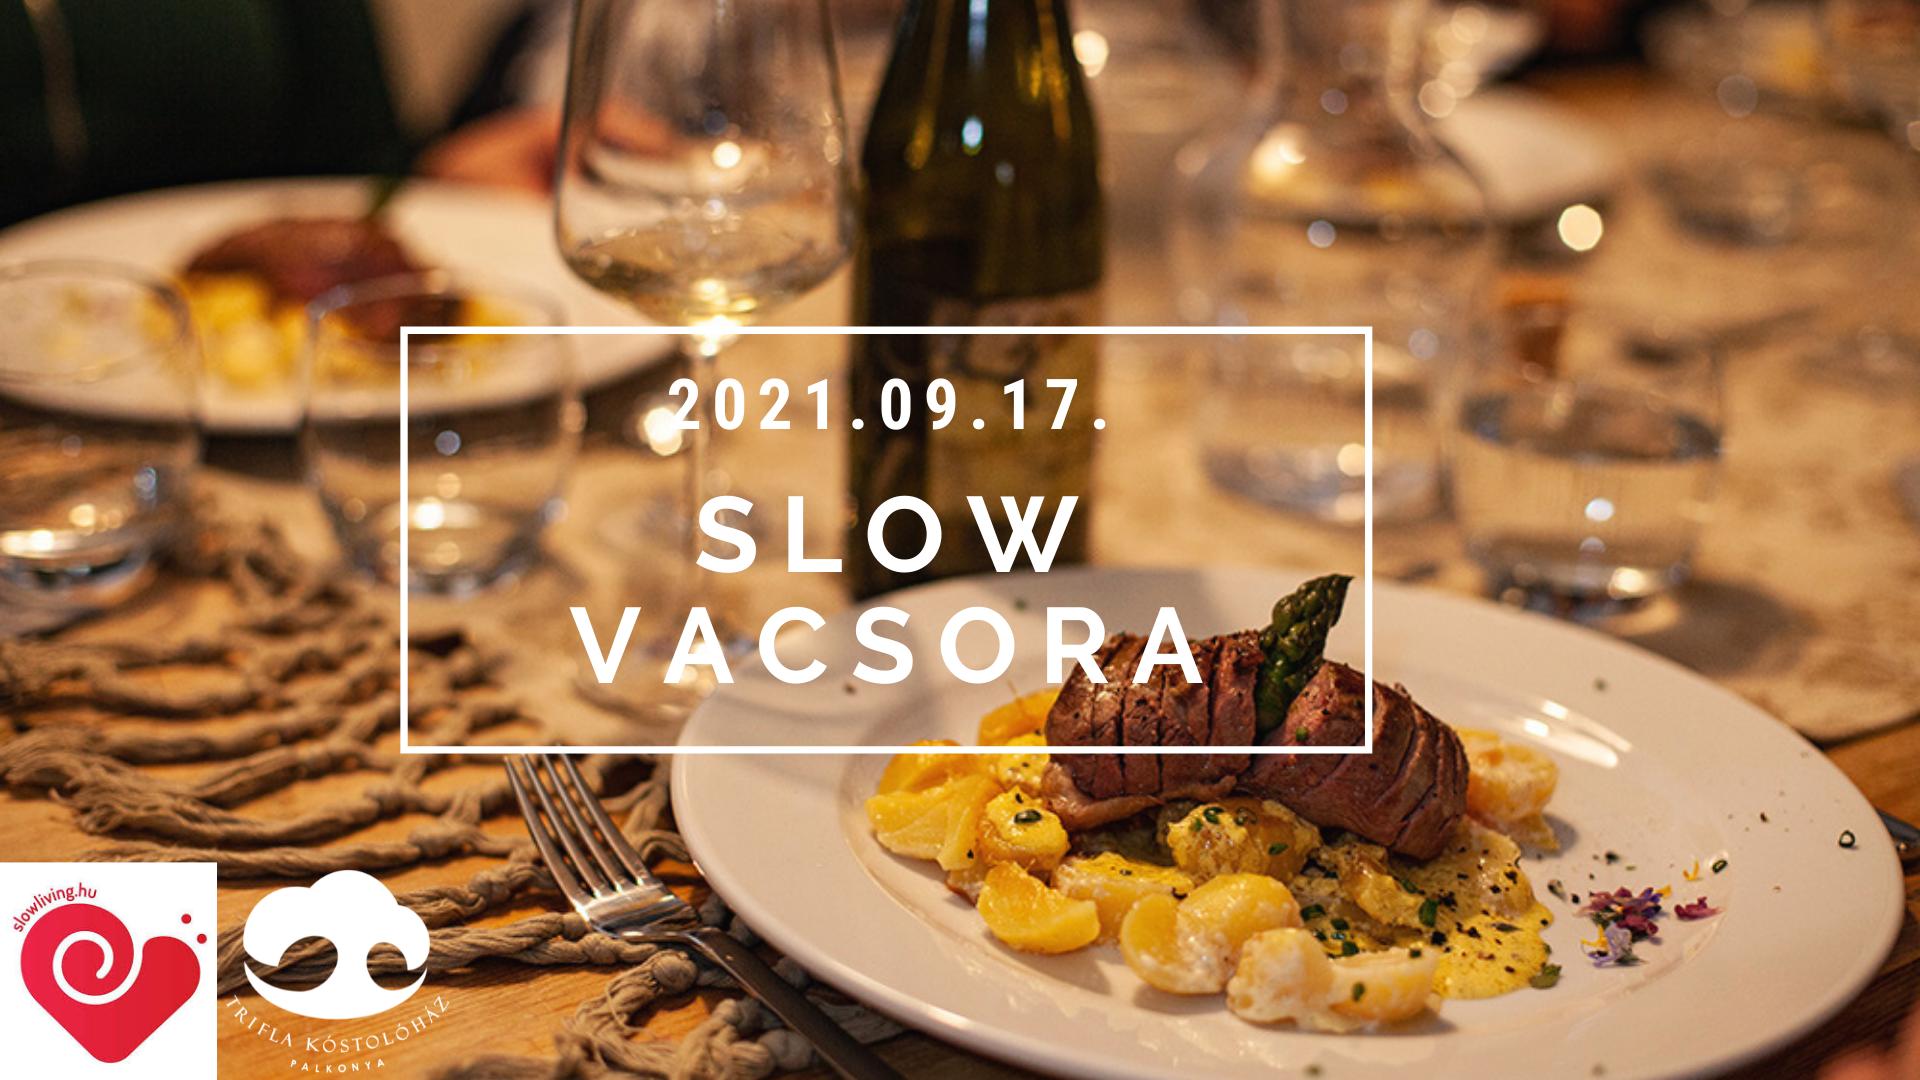 Slow vacsora est